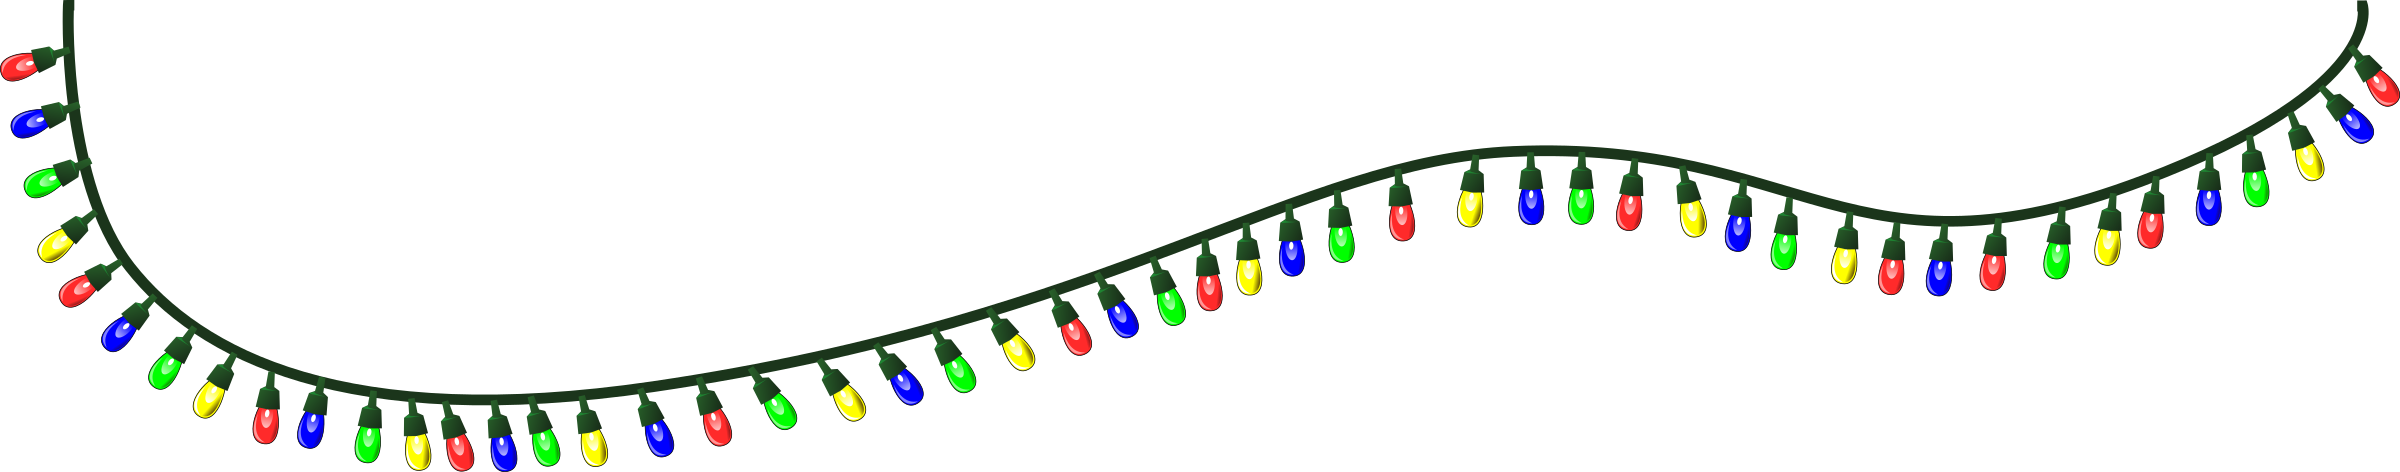 Christmas lights clipart tumundografico